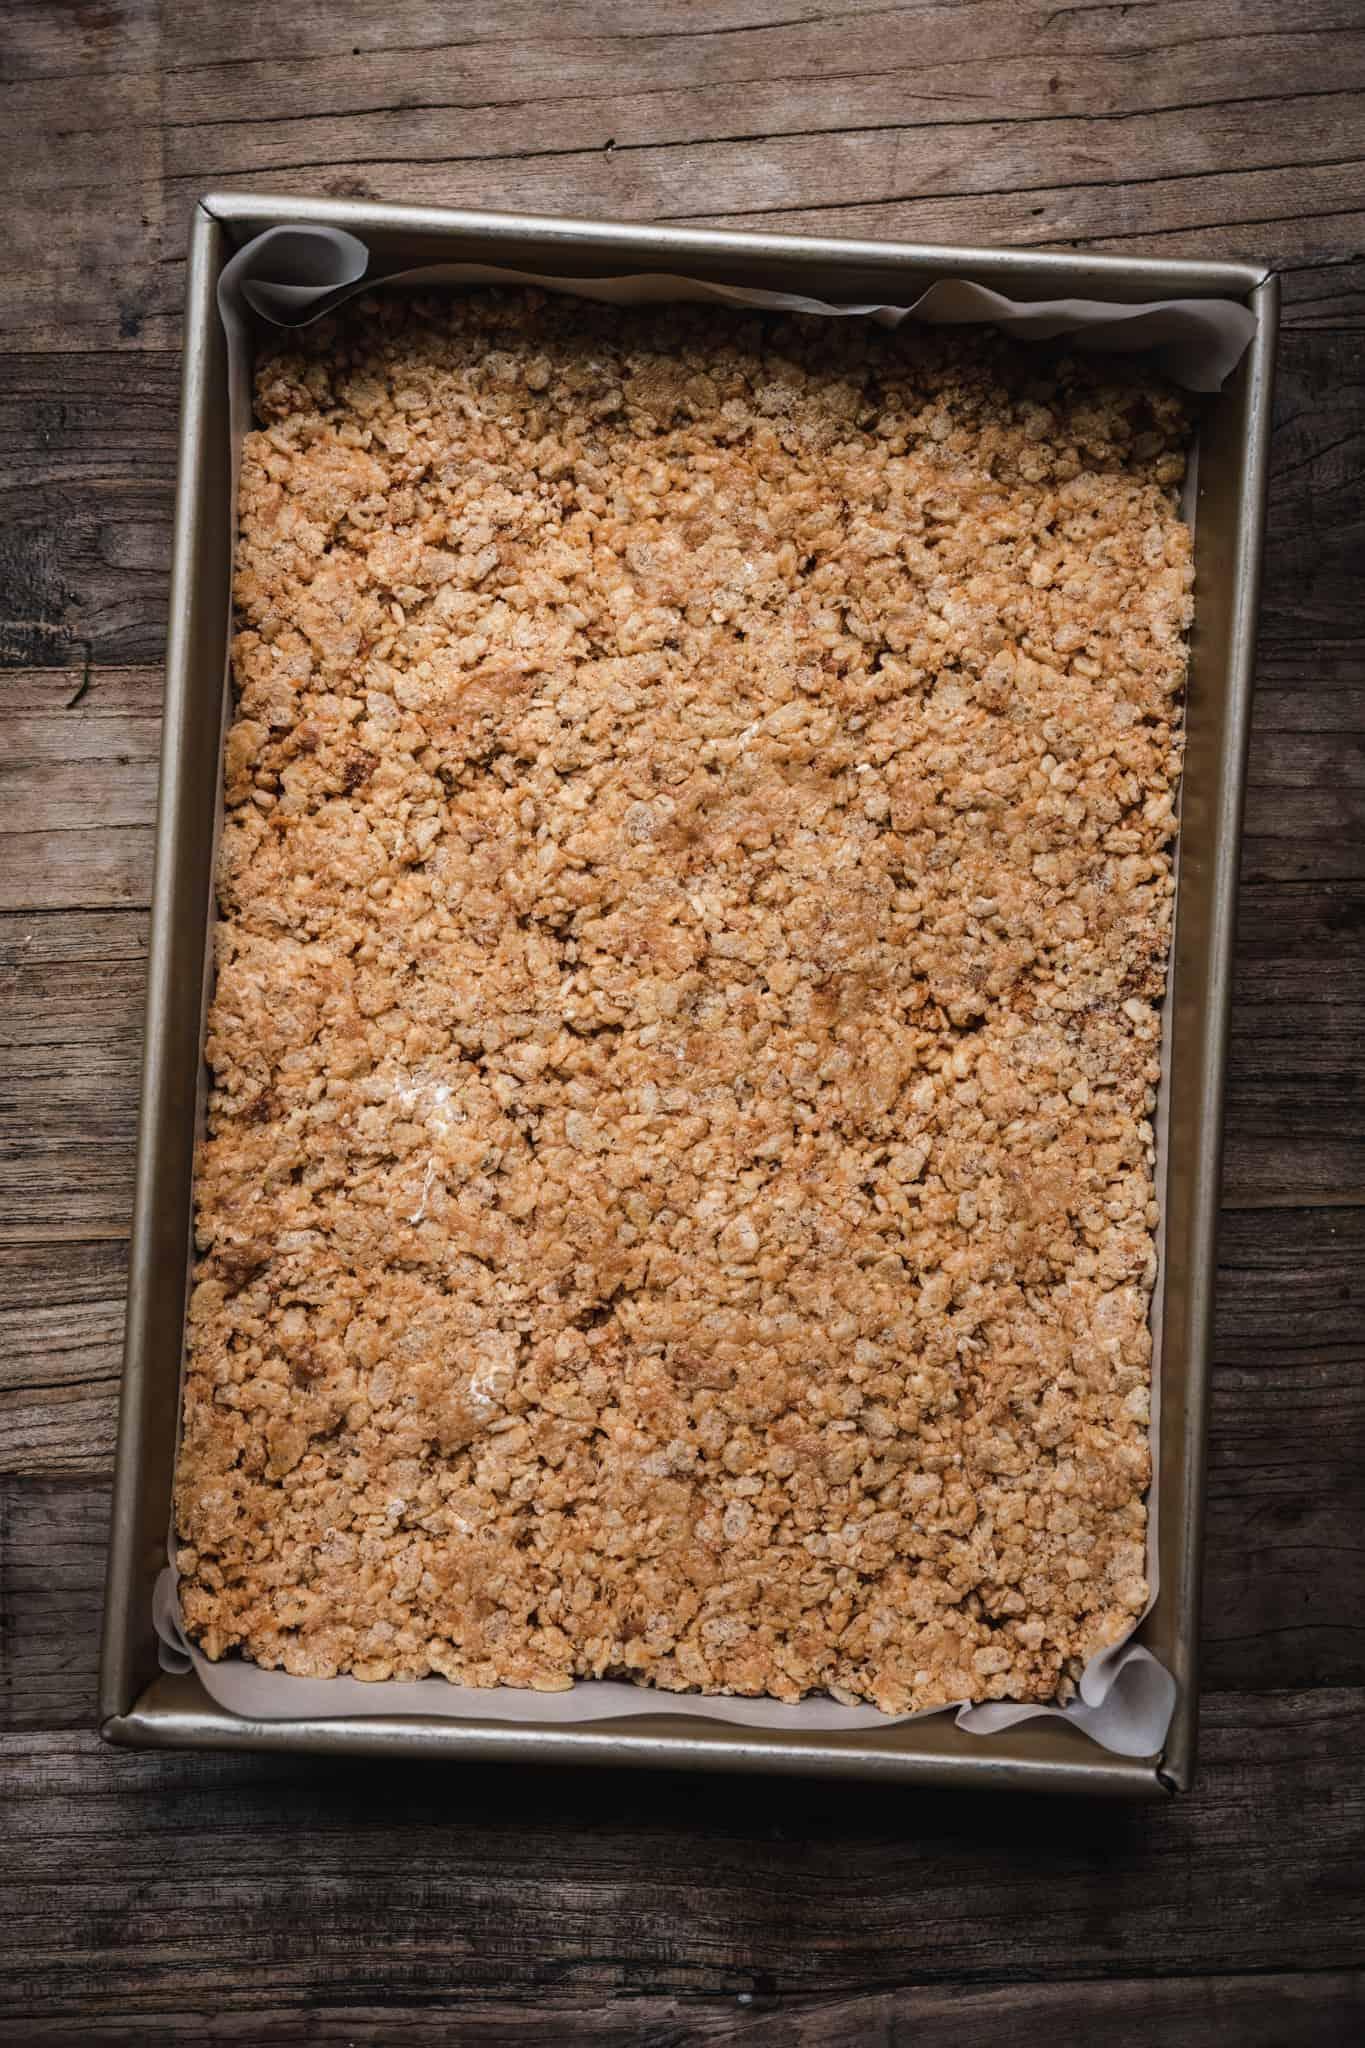 overhead of vegan peanut butter rice krispy dough pressed into a prepared baking dish